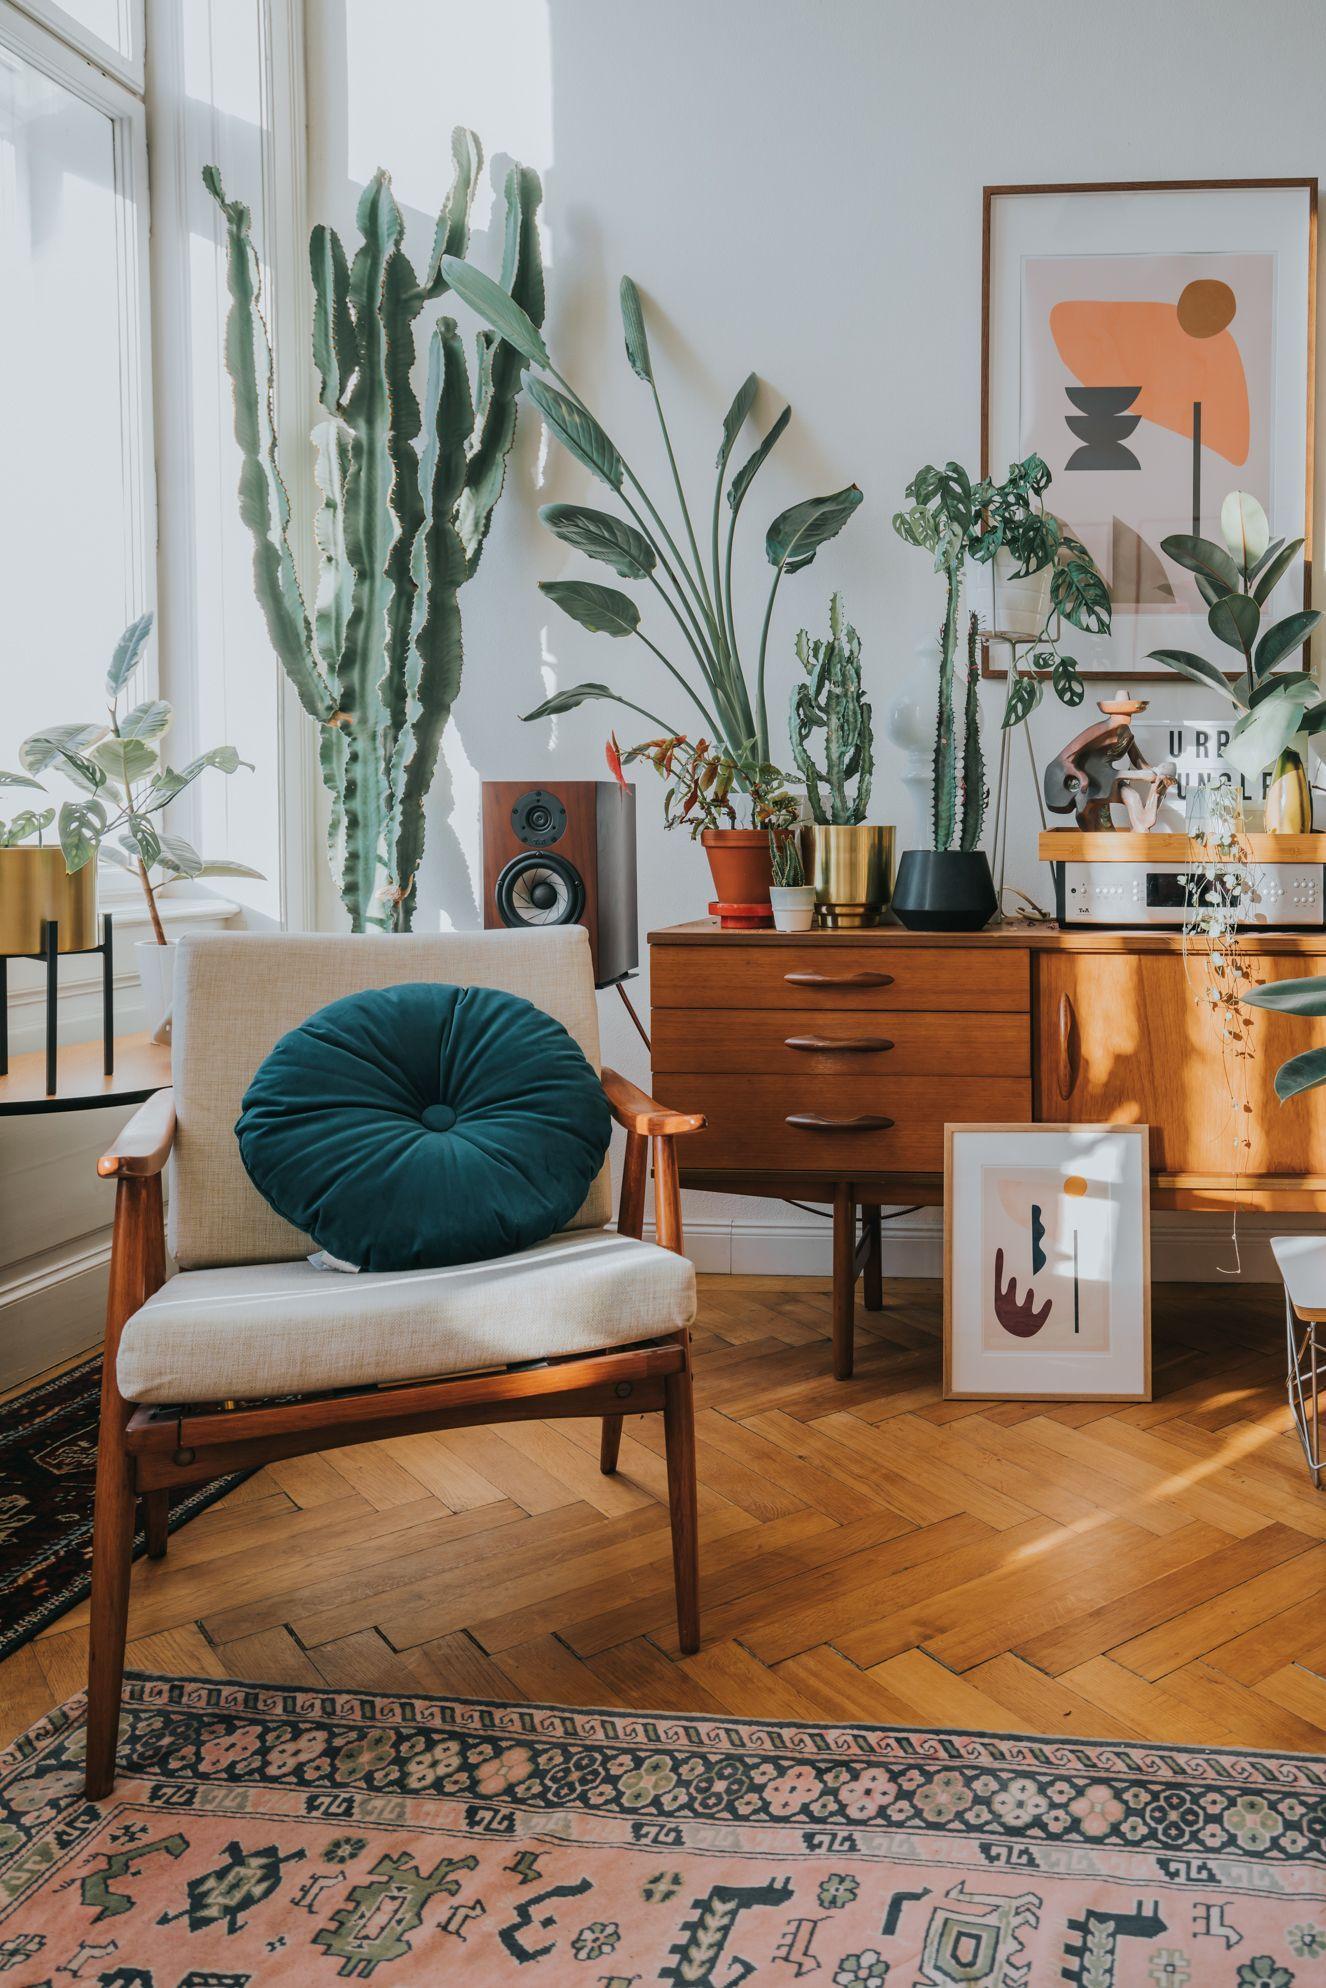 What S Hot On Pinterest Why Scandinavian Pastel Decor Unique Blog Cool Room Designs Decor Interior Design Room Decor